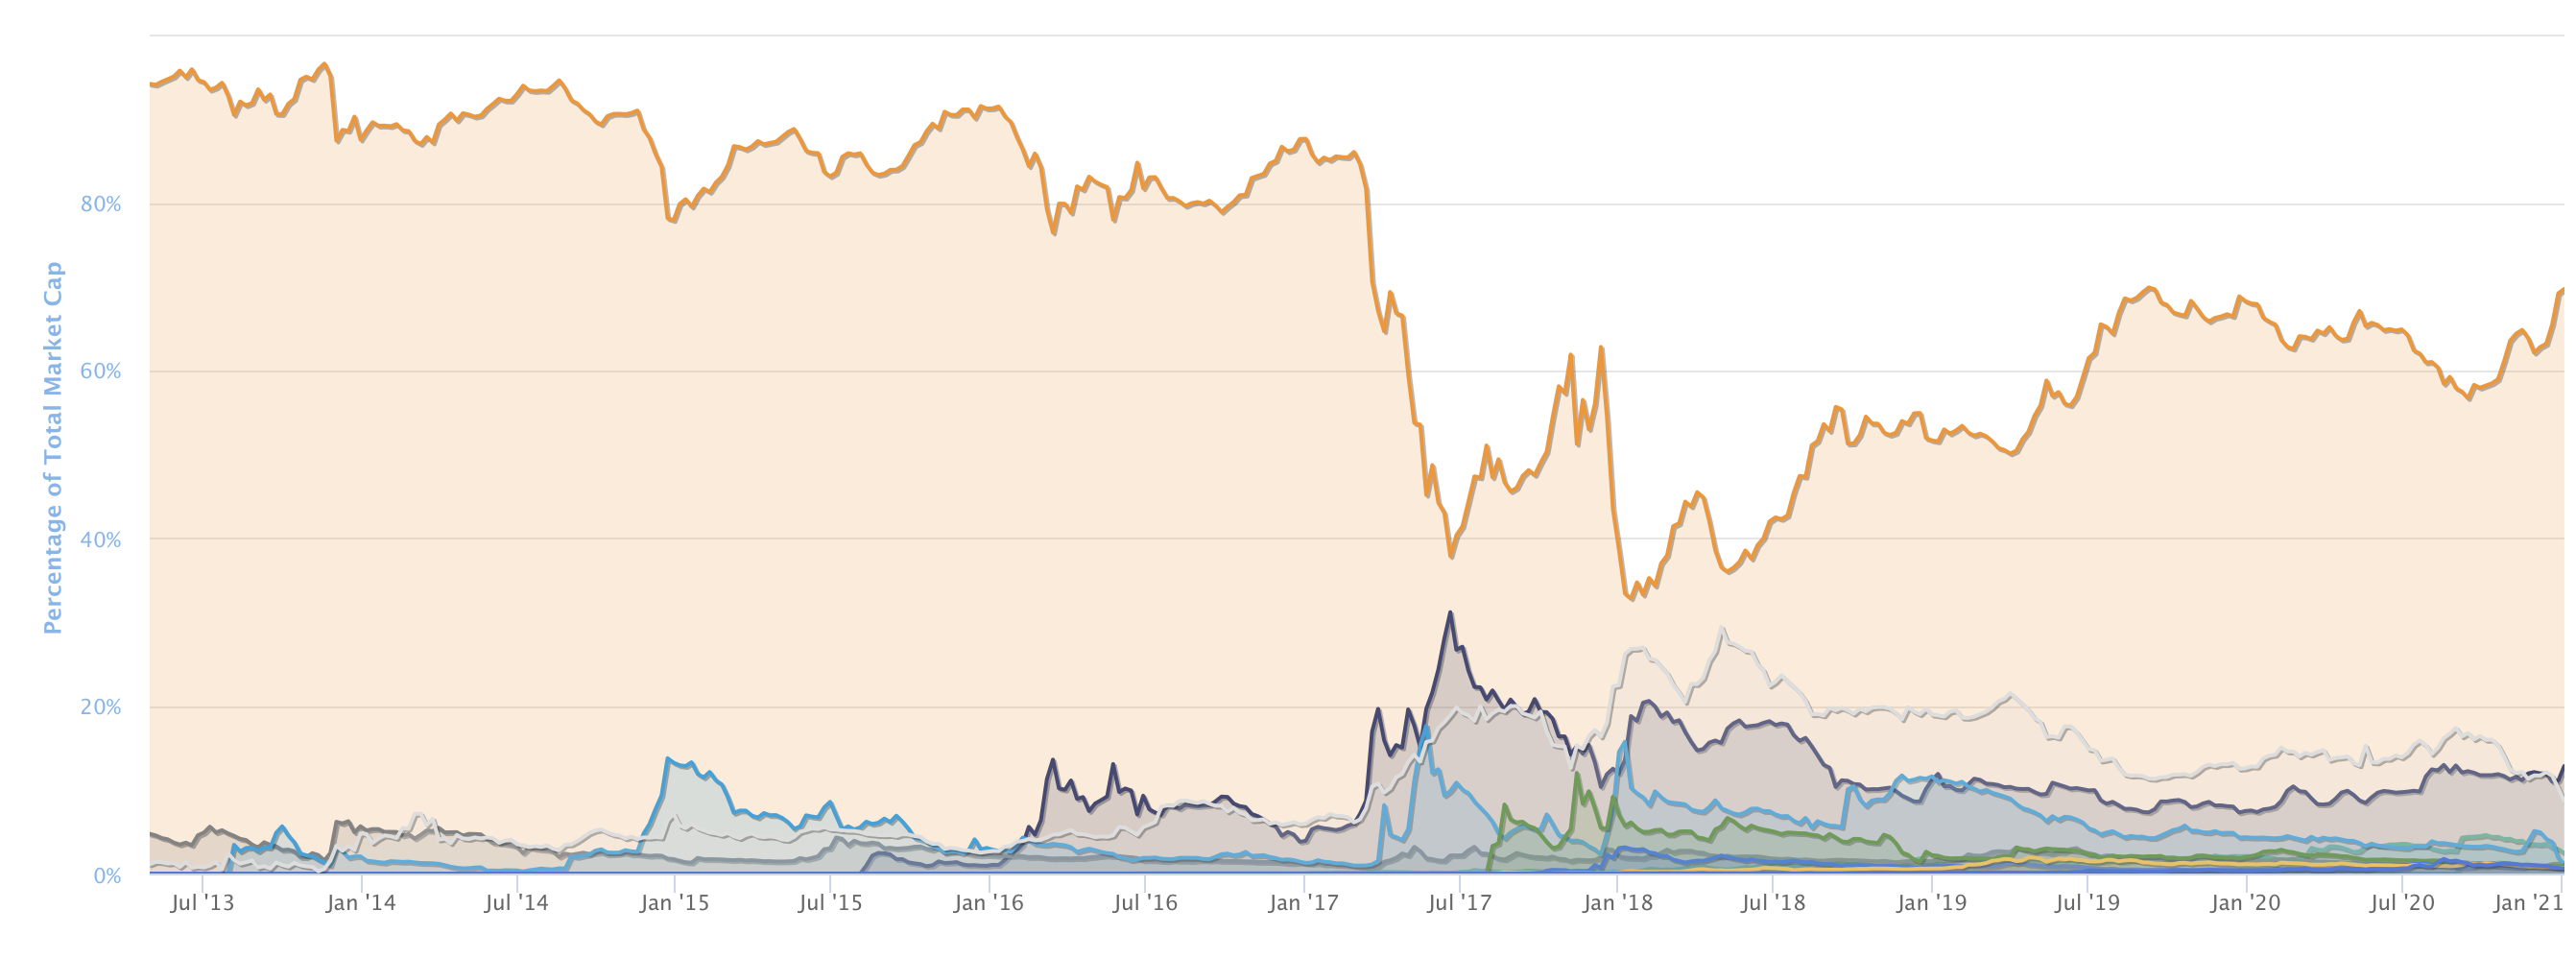 Kriptovaluta dominancia I Cryptofalka